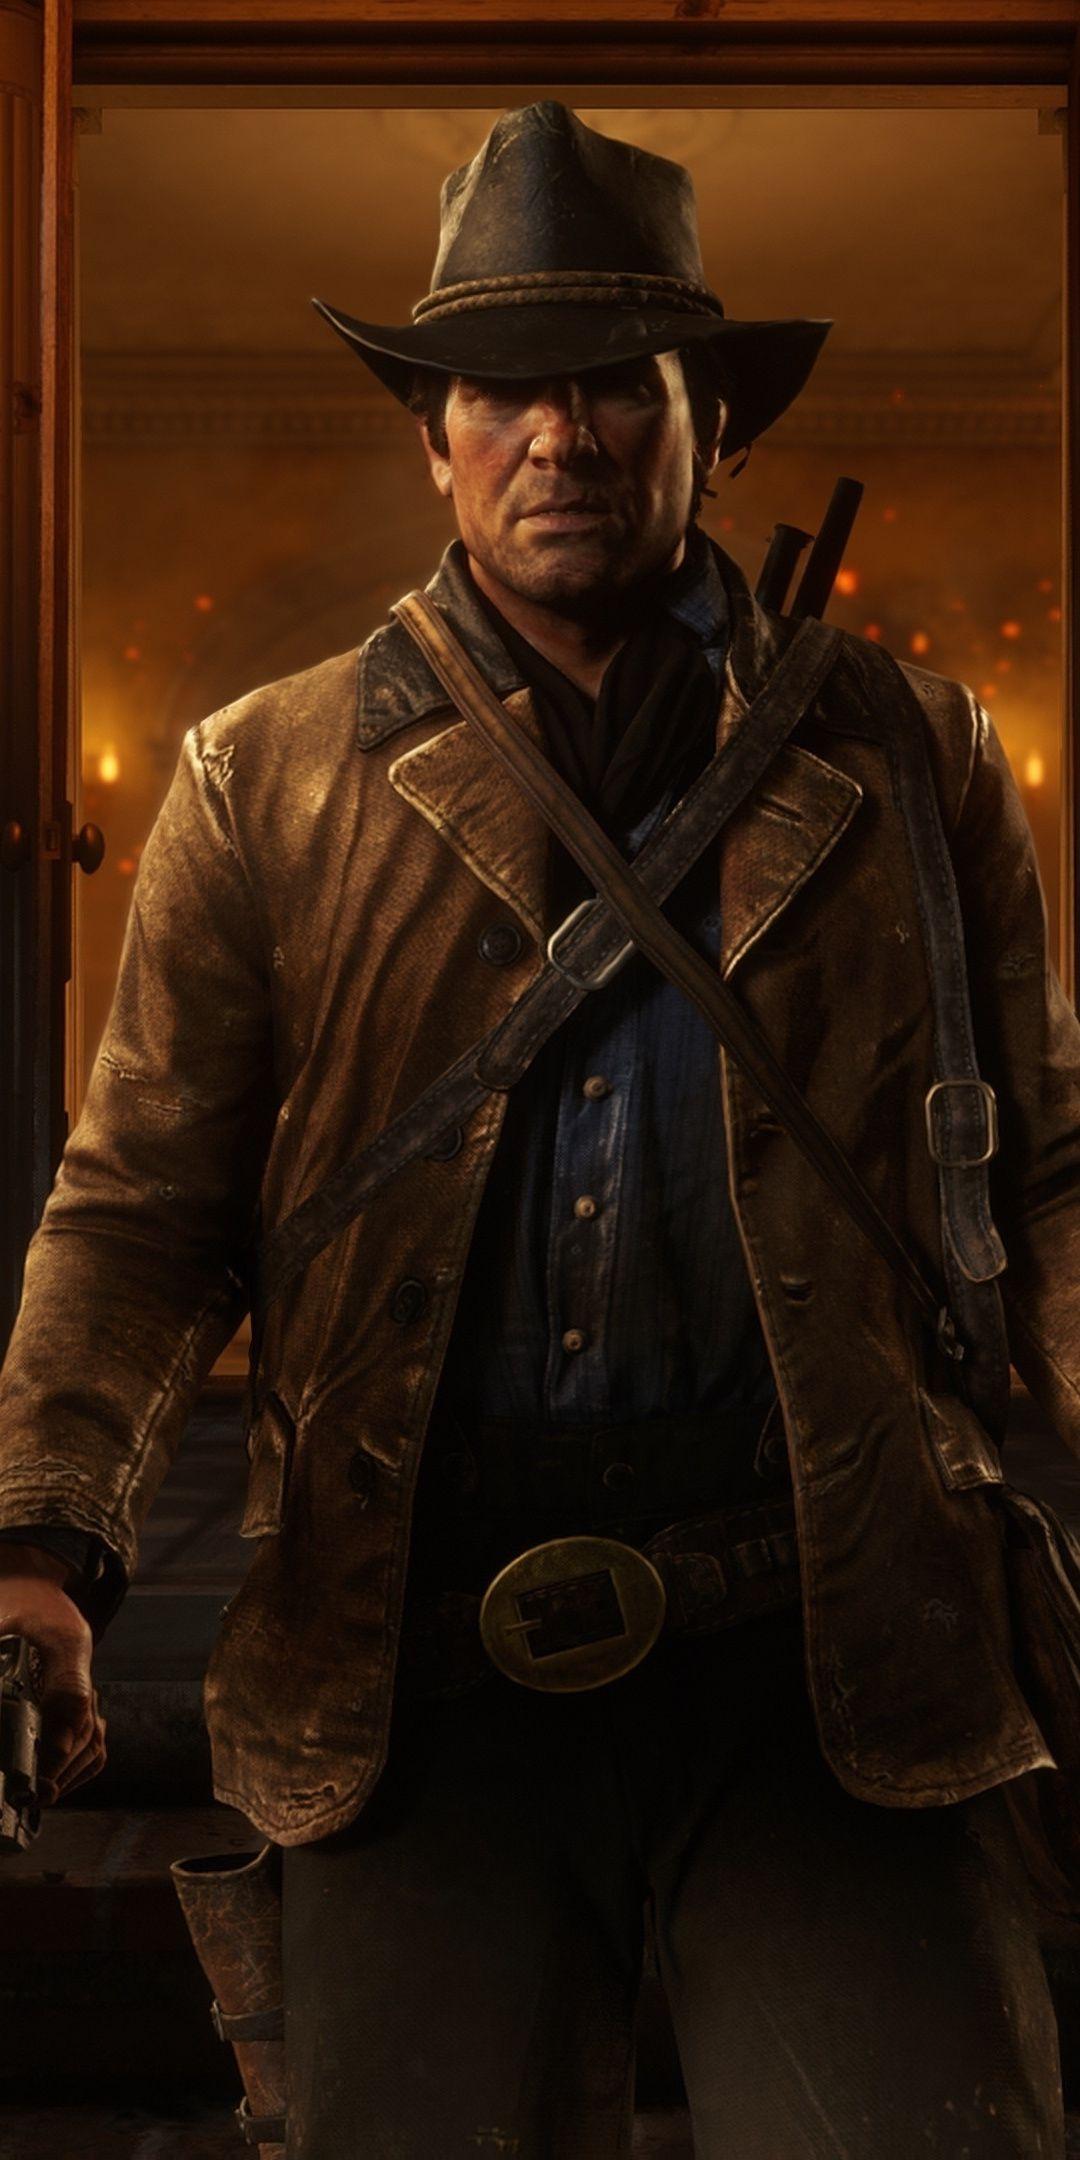 Video game, 2018, Red Dead Redepmption 2, Arthur